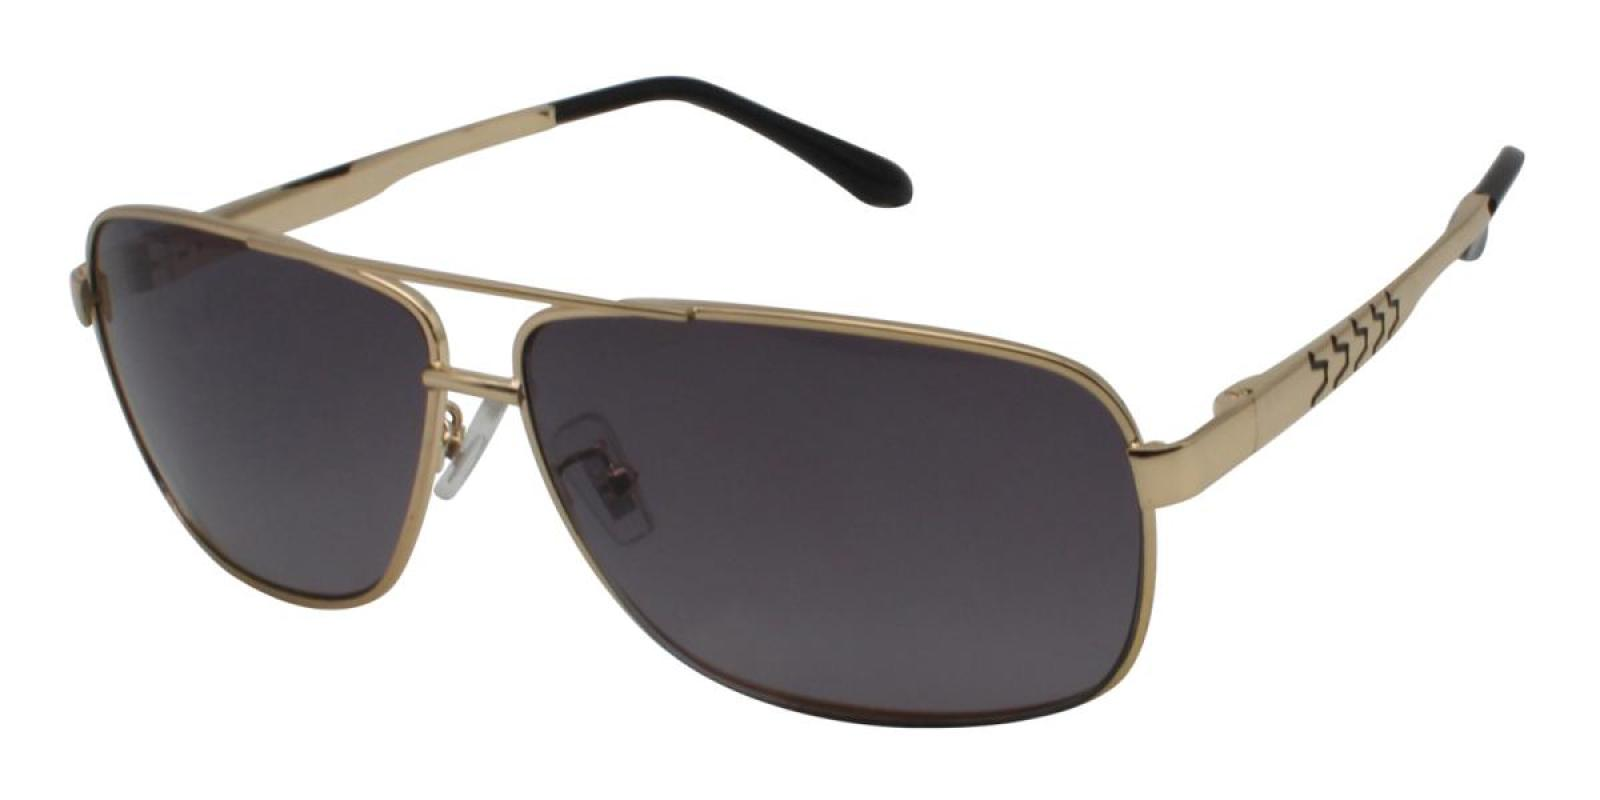 Marchisio-Gold-Aviator-Metal-Sunglasses-additional1